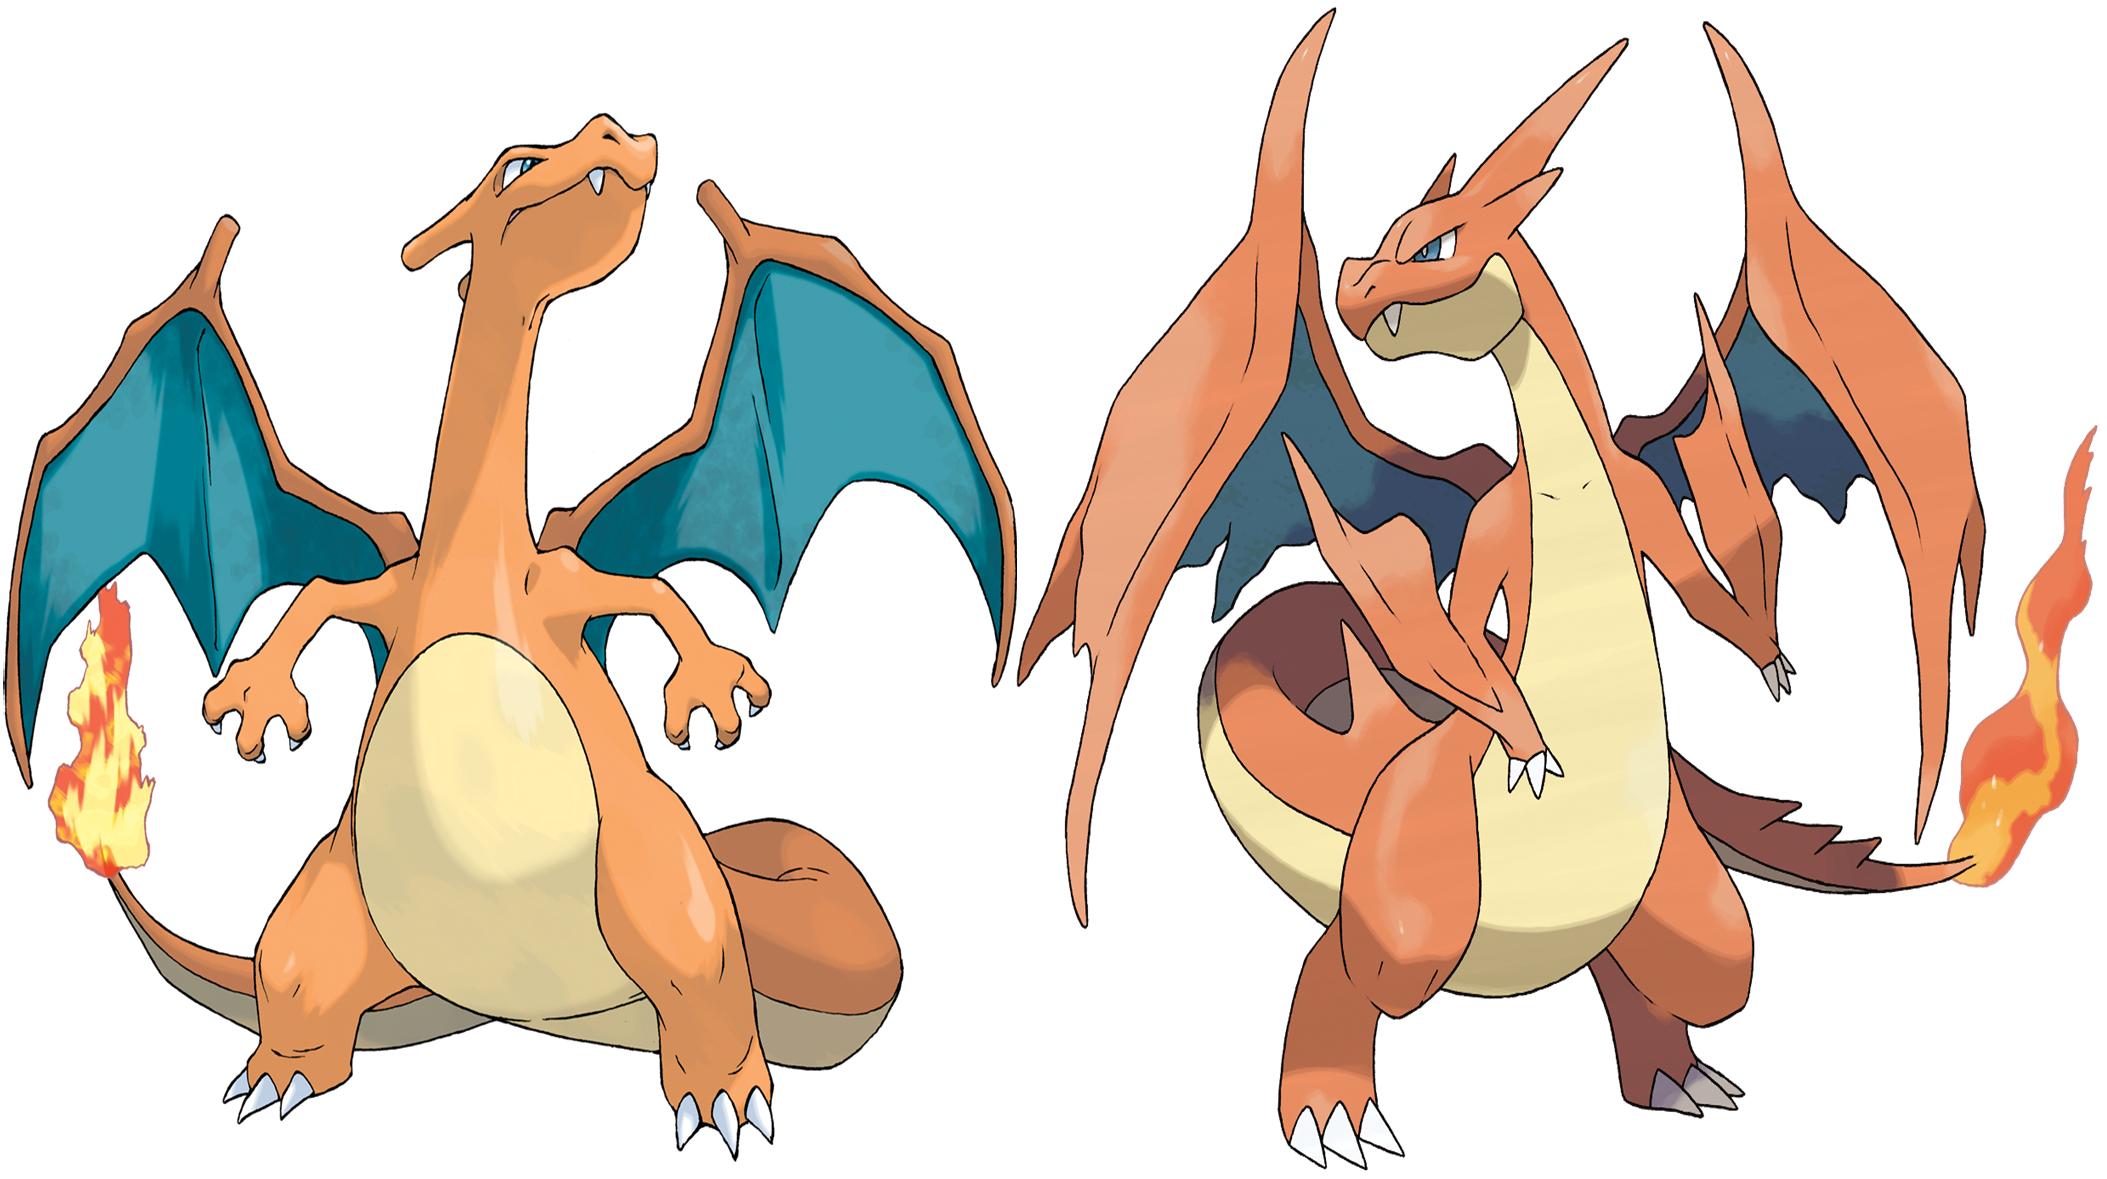 Mega Charizard | Pokémon: Mega Fakemon | Pinterest ... |Pokemon X And Y Mega Evolutions Charizard